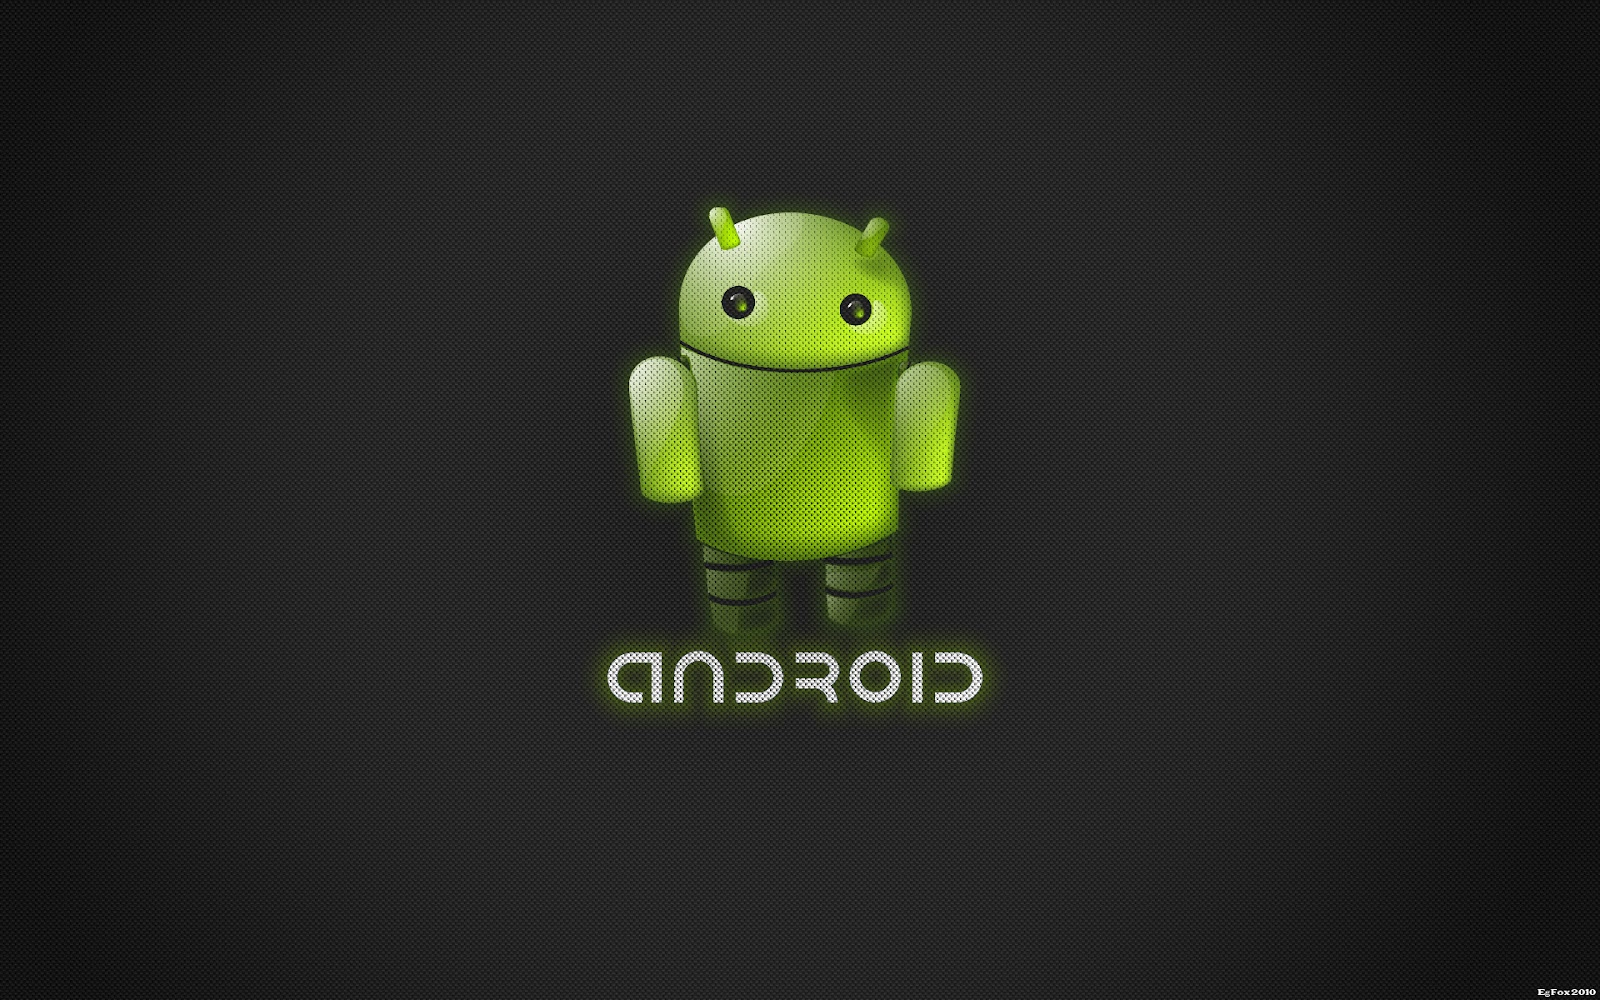 http://2.bp.blogspot.com/-jEqVe4vh04Q/UEzG5HDlLMI/AAAAAAAAAIo/1qh-G9rYaLE/s1600/EgFox_Android_HD_2010_by_Eg_Art.jpg